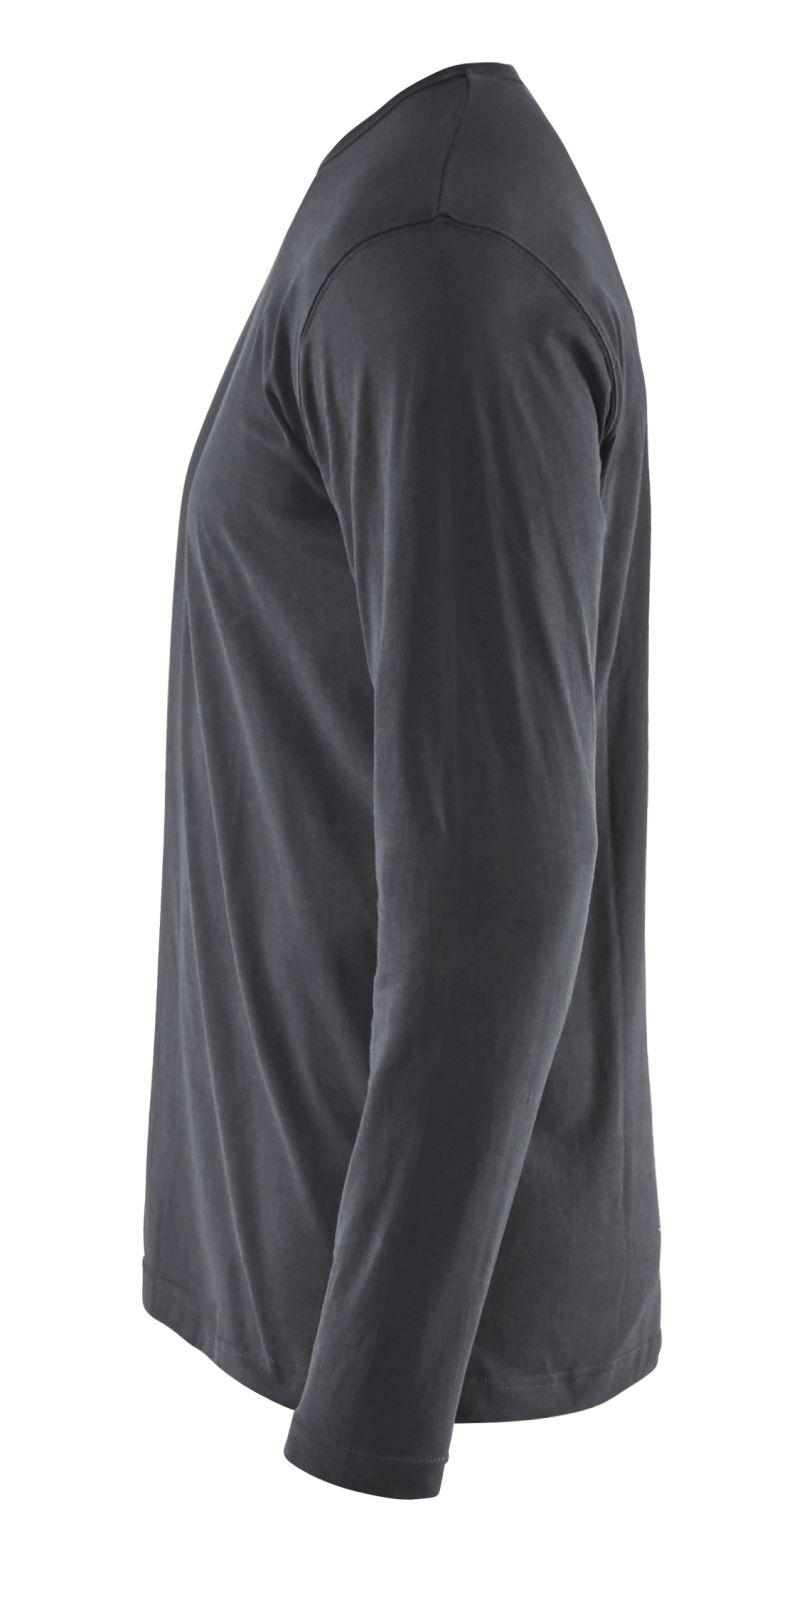 Blaklader T-shirts 35001042 donkergrijs(9800)